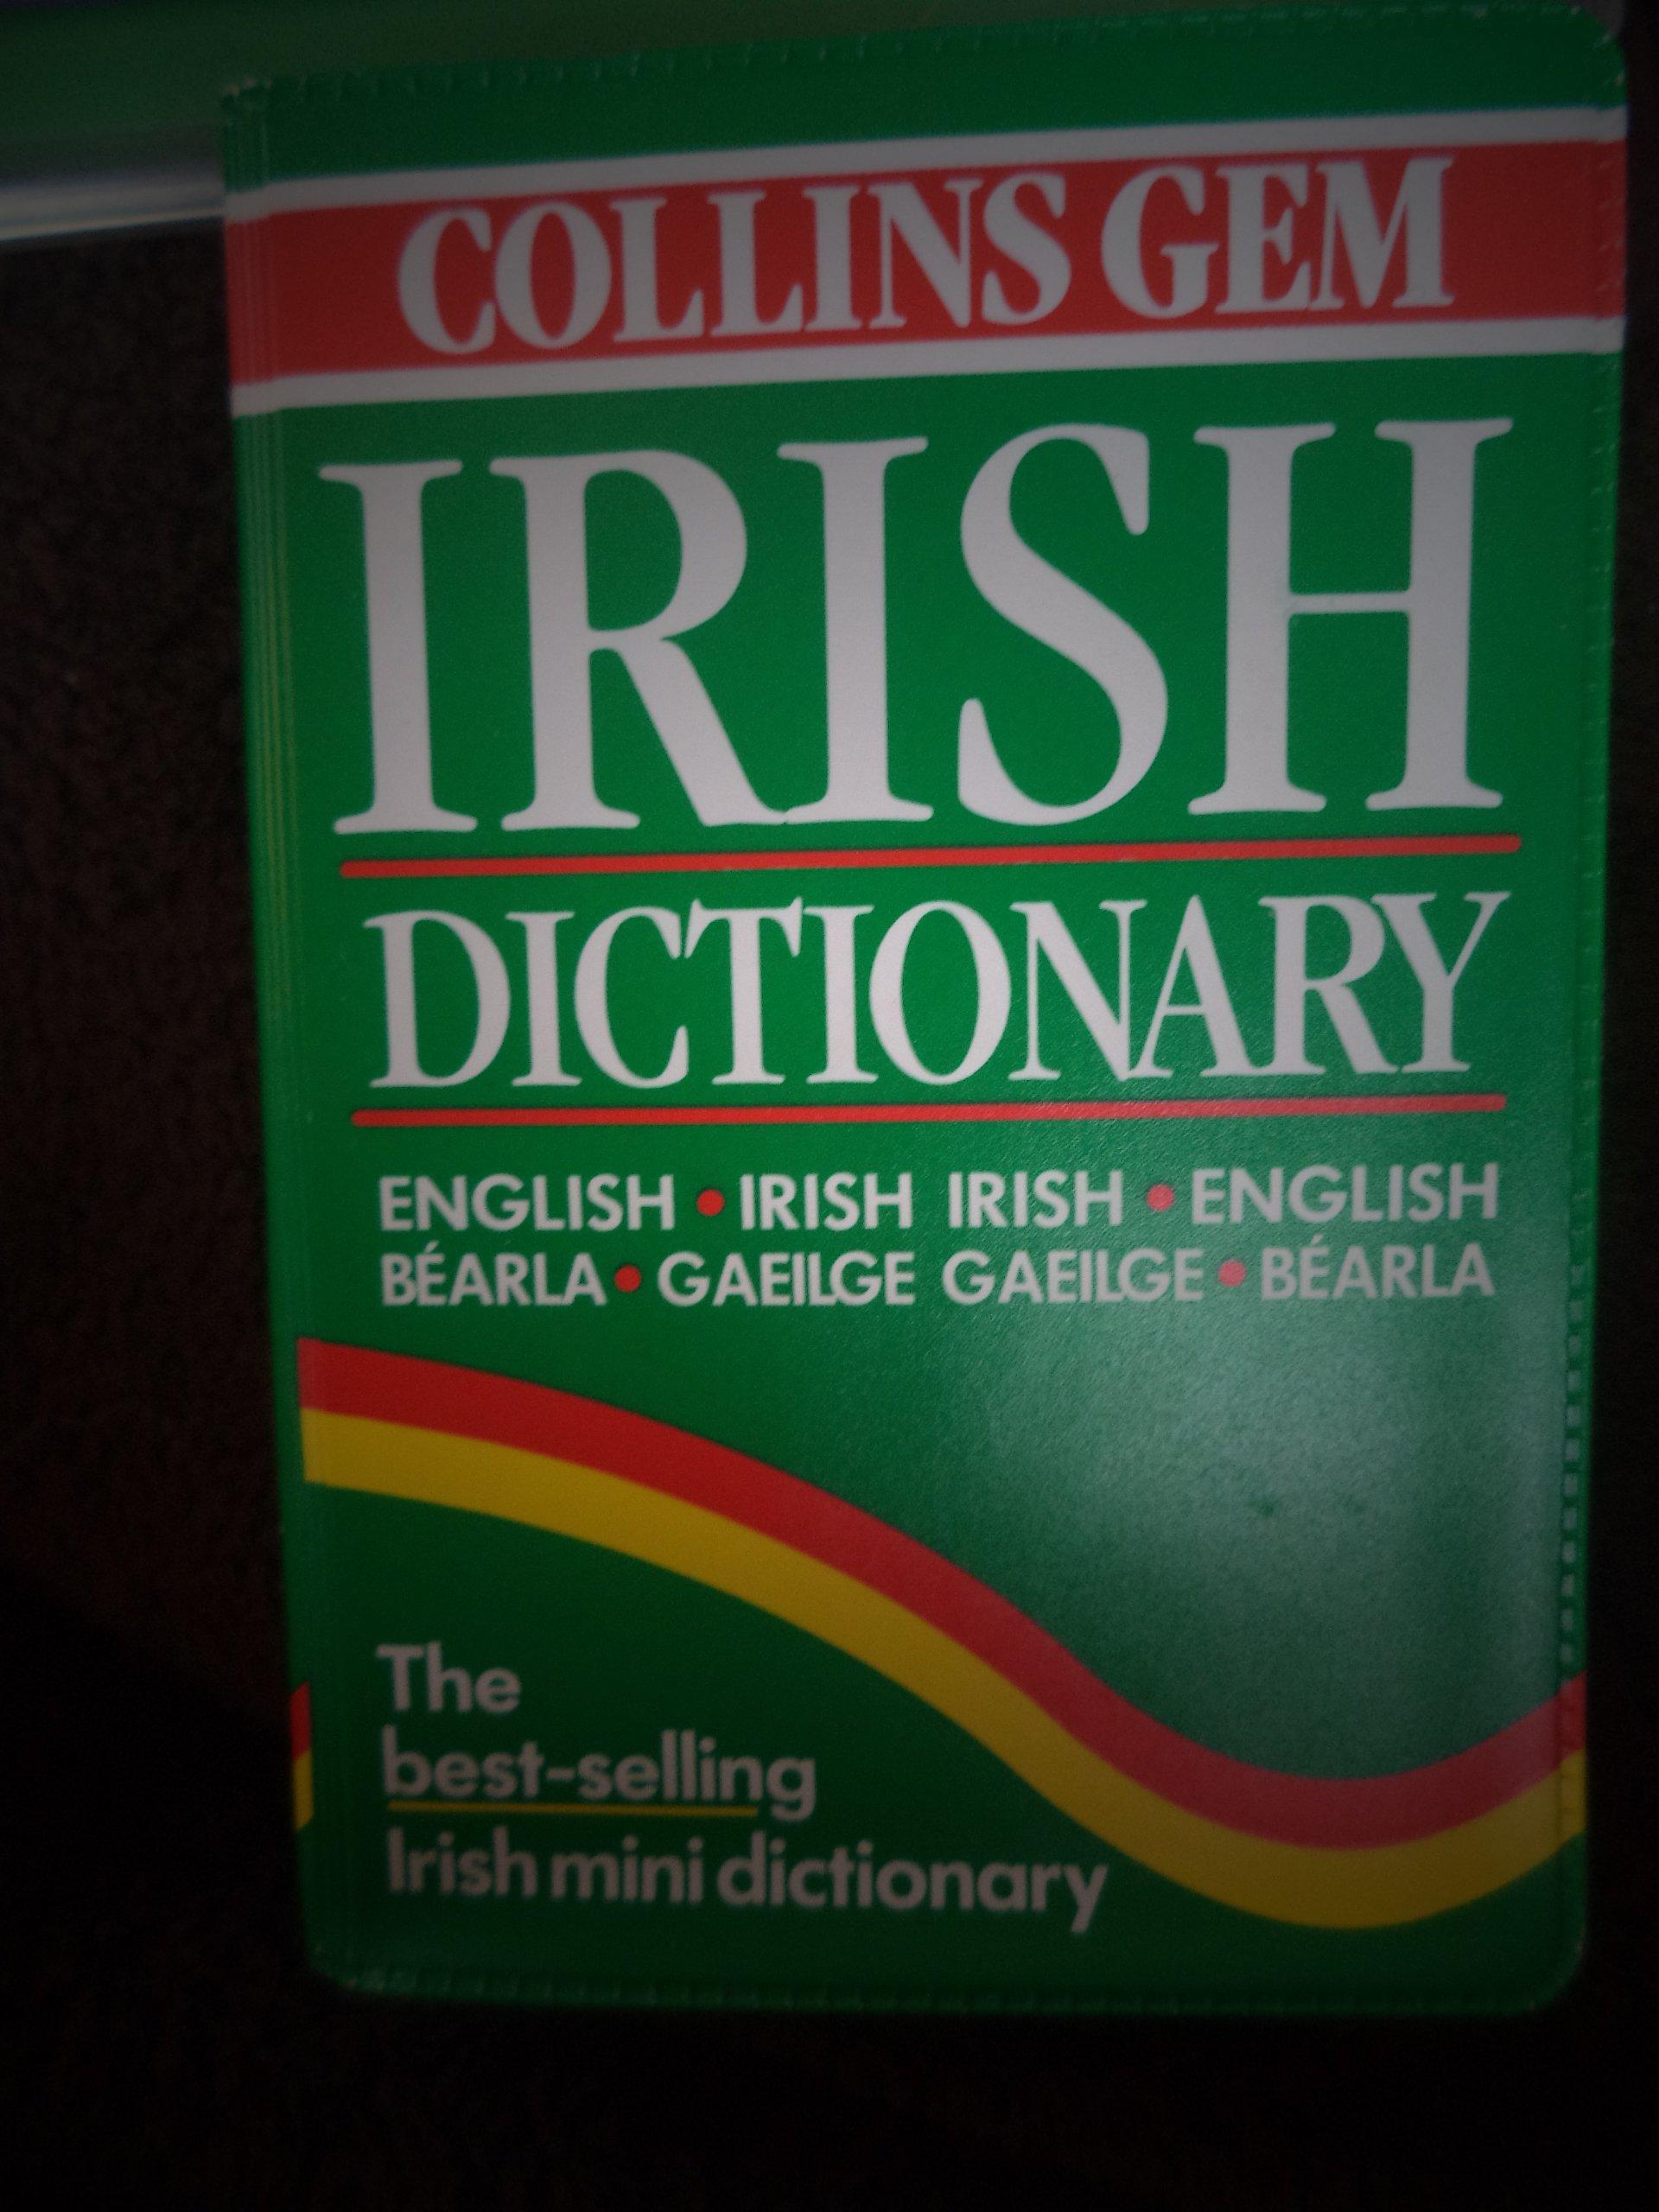 Irish Dictionary (Collins Gem) (Collins Gems): Amazon.co.uk: Seamus Mac  Mathuna, Harper Collins Publishers: 9780004707532: Books